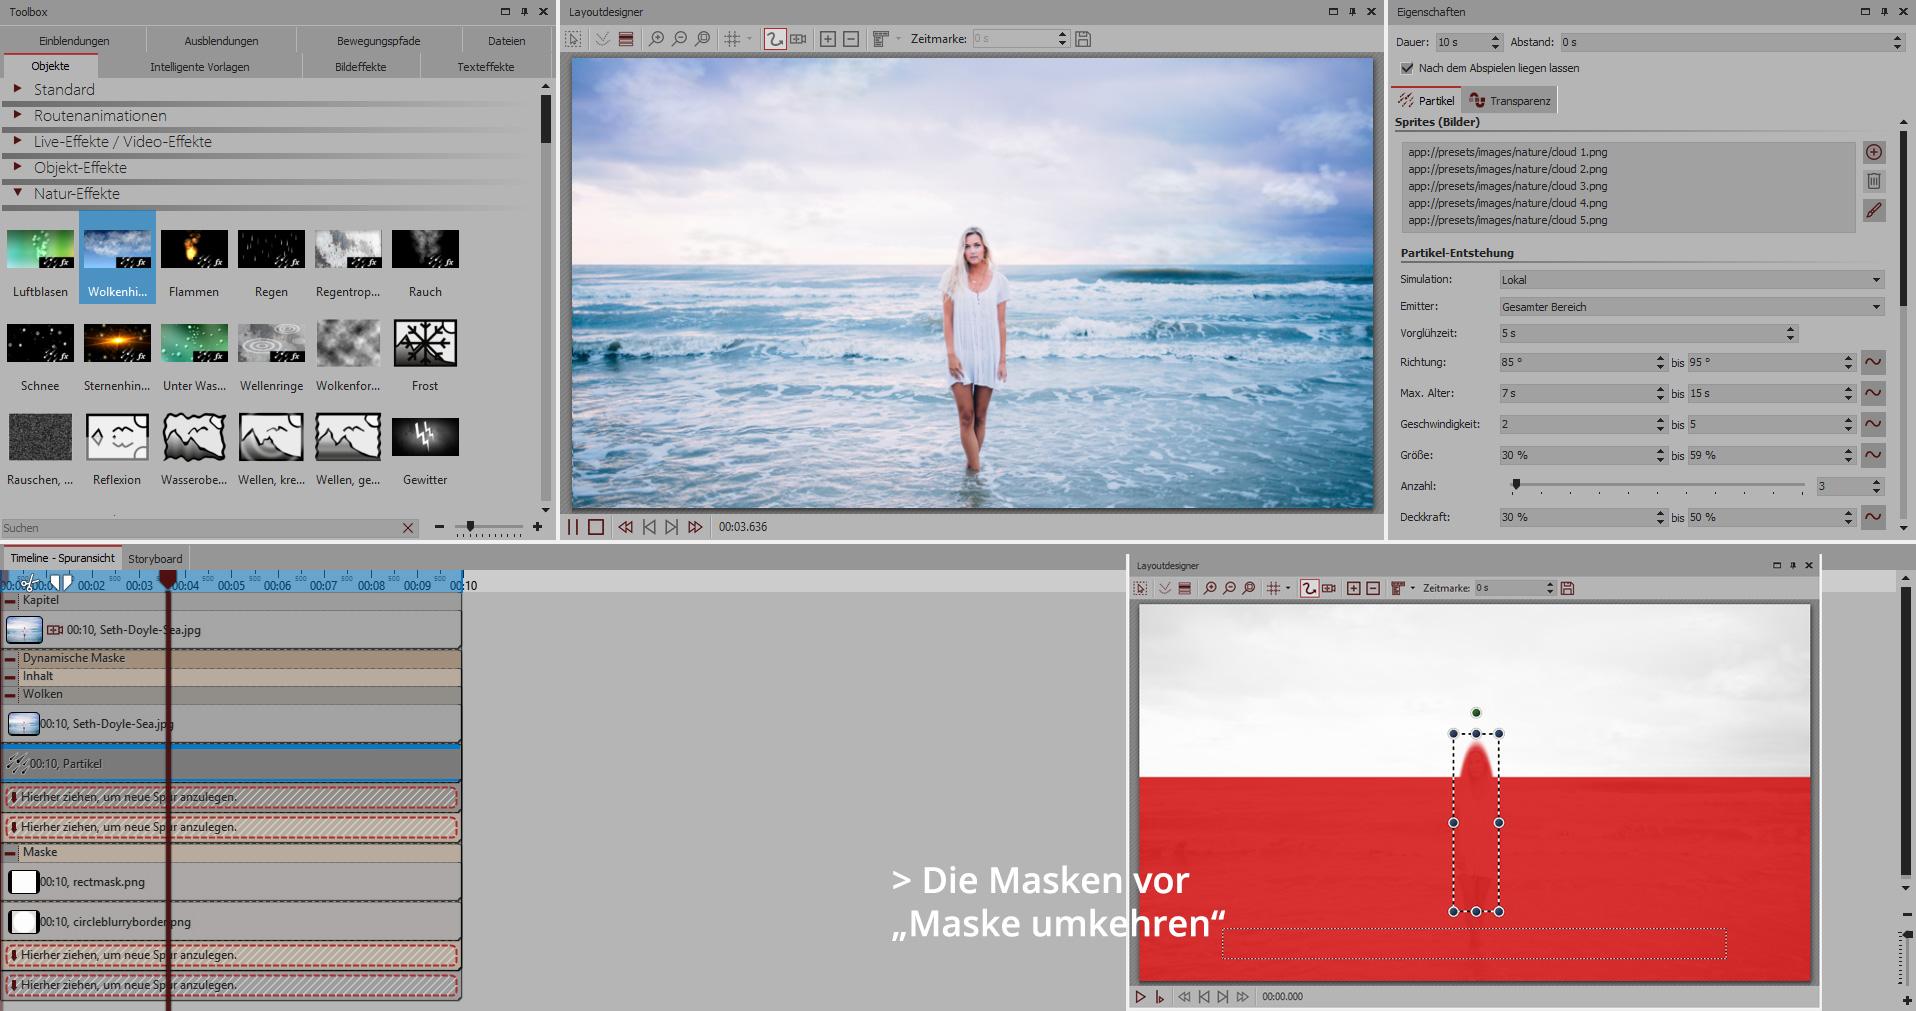 Natur-Effekte für lebendige Fotos - AquaSoft Hilfe